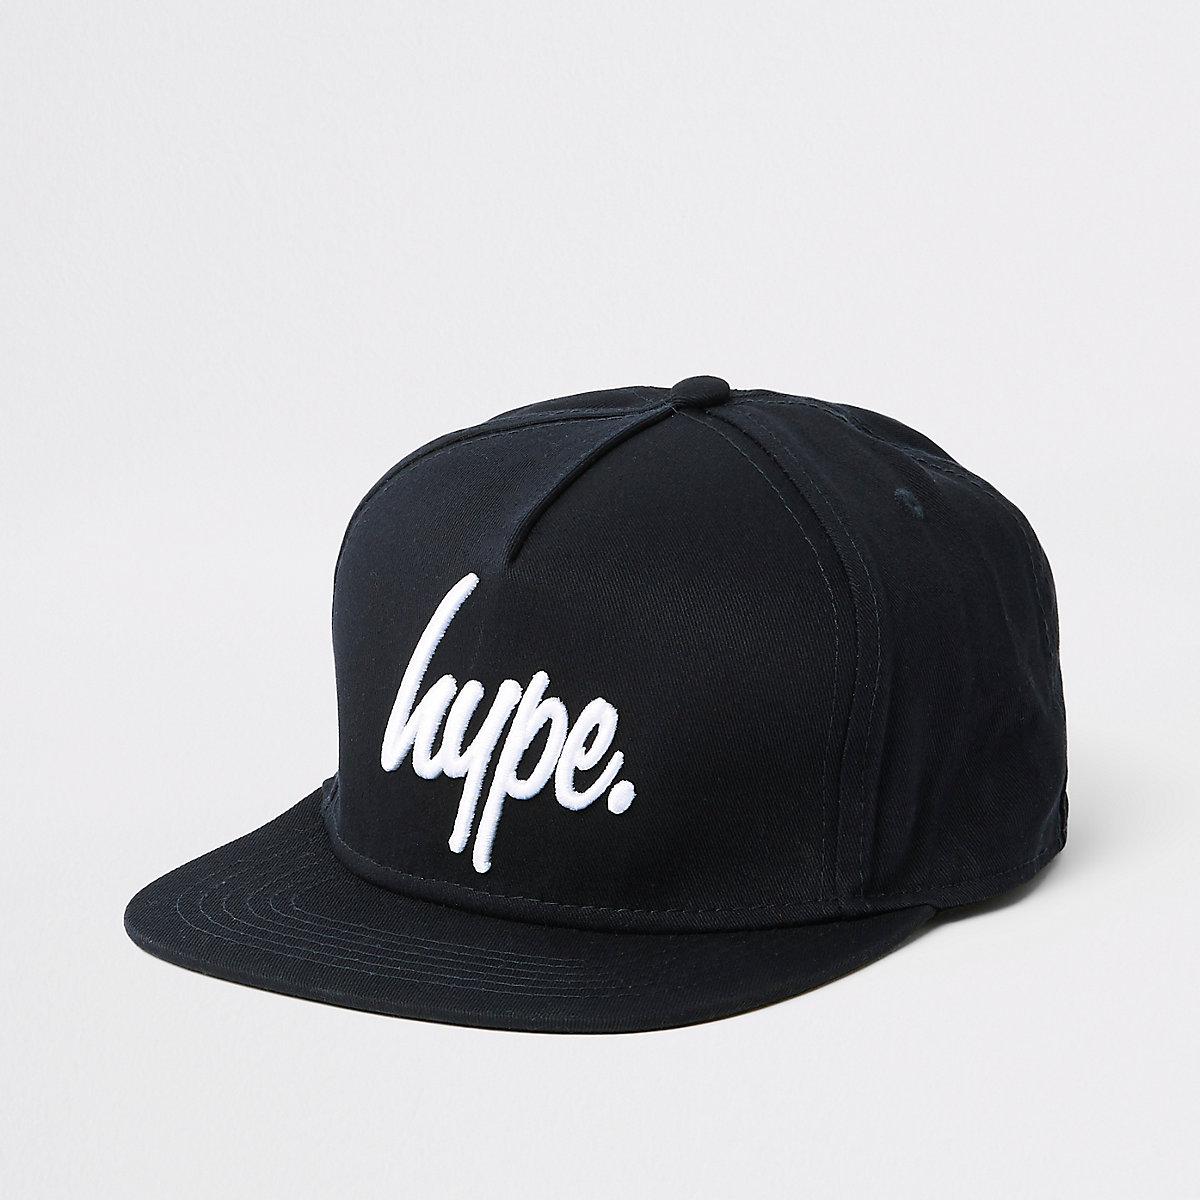 Boys Hype navy snapback cap - Hats - Accessories - boys e504c07344b6